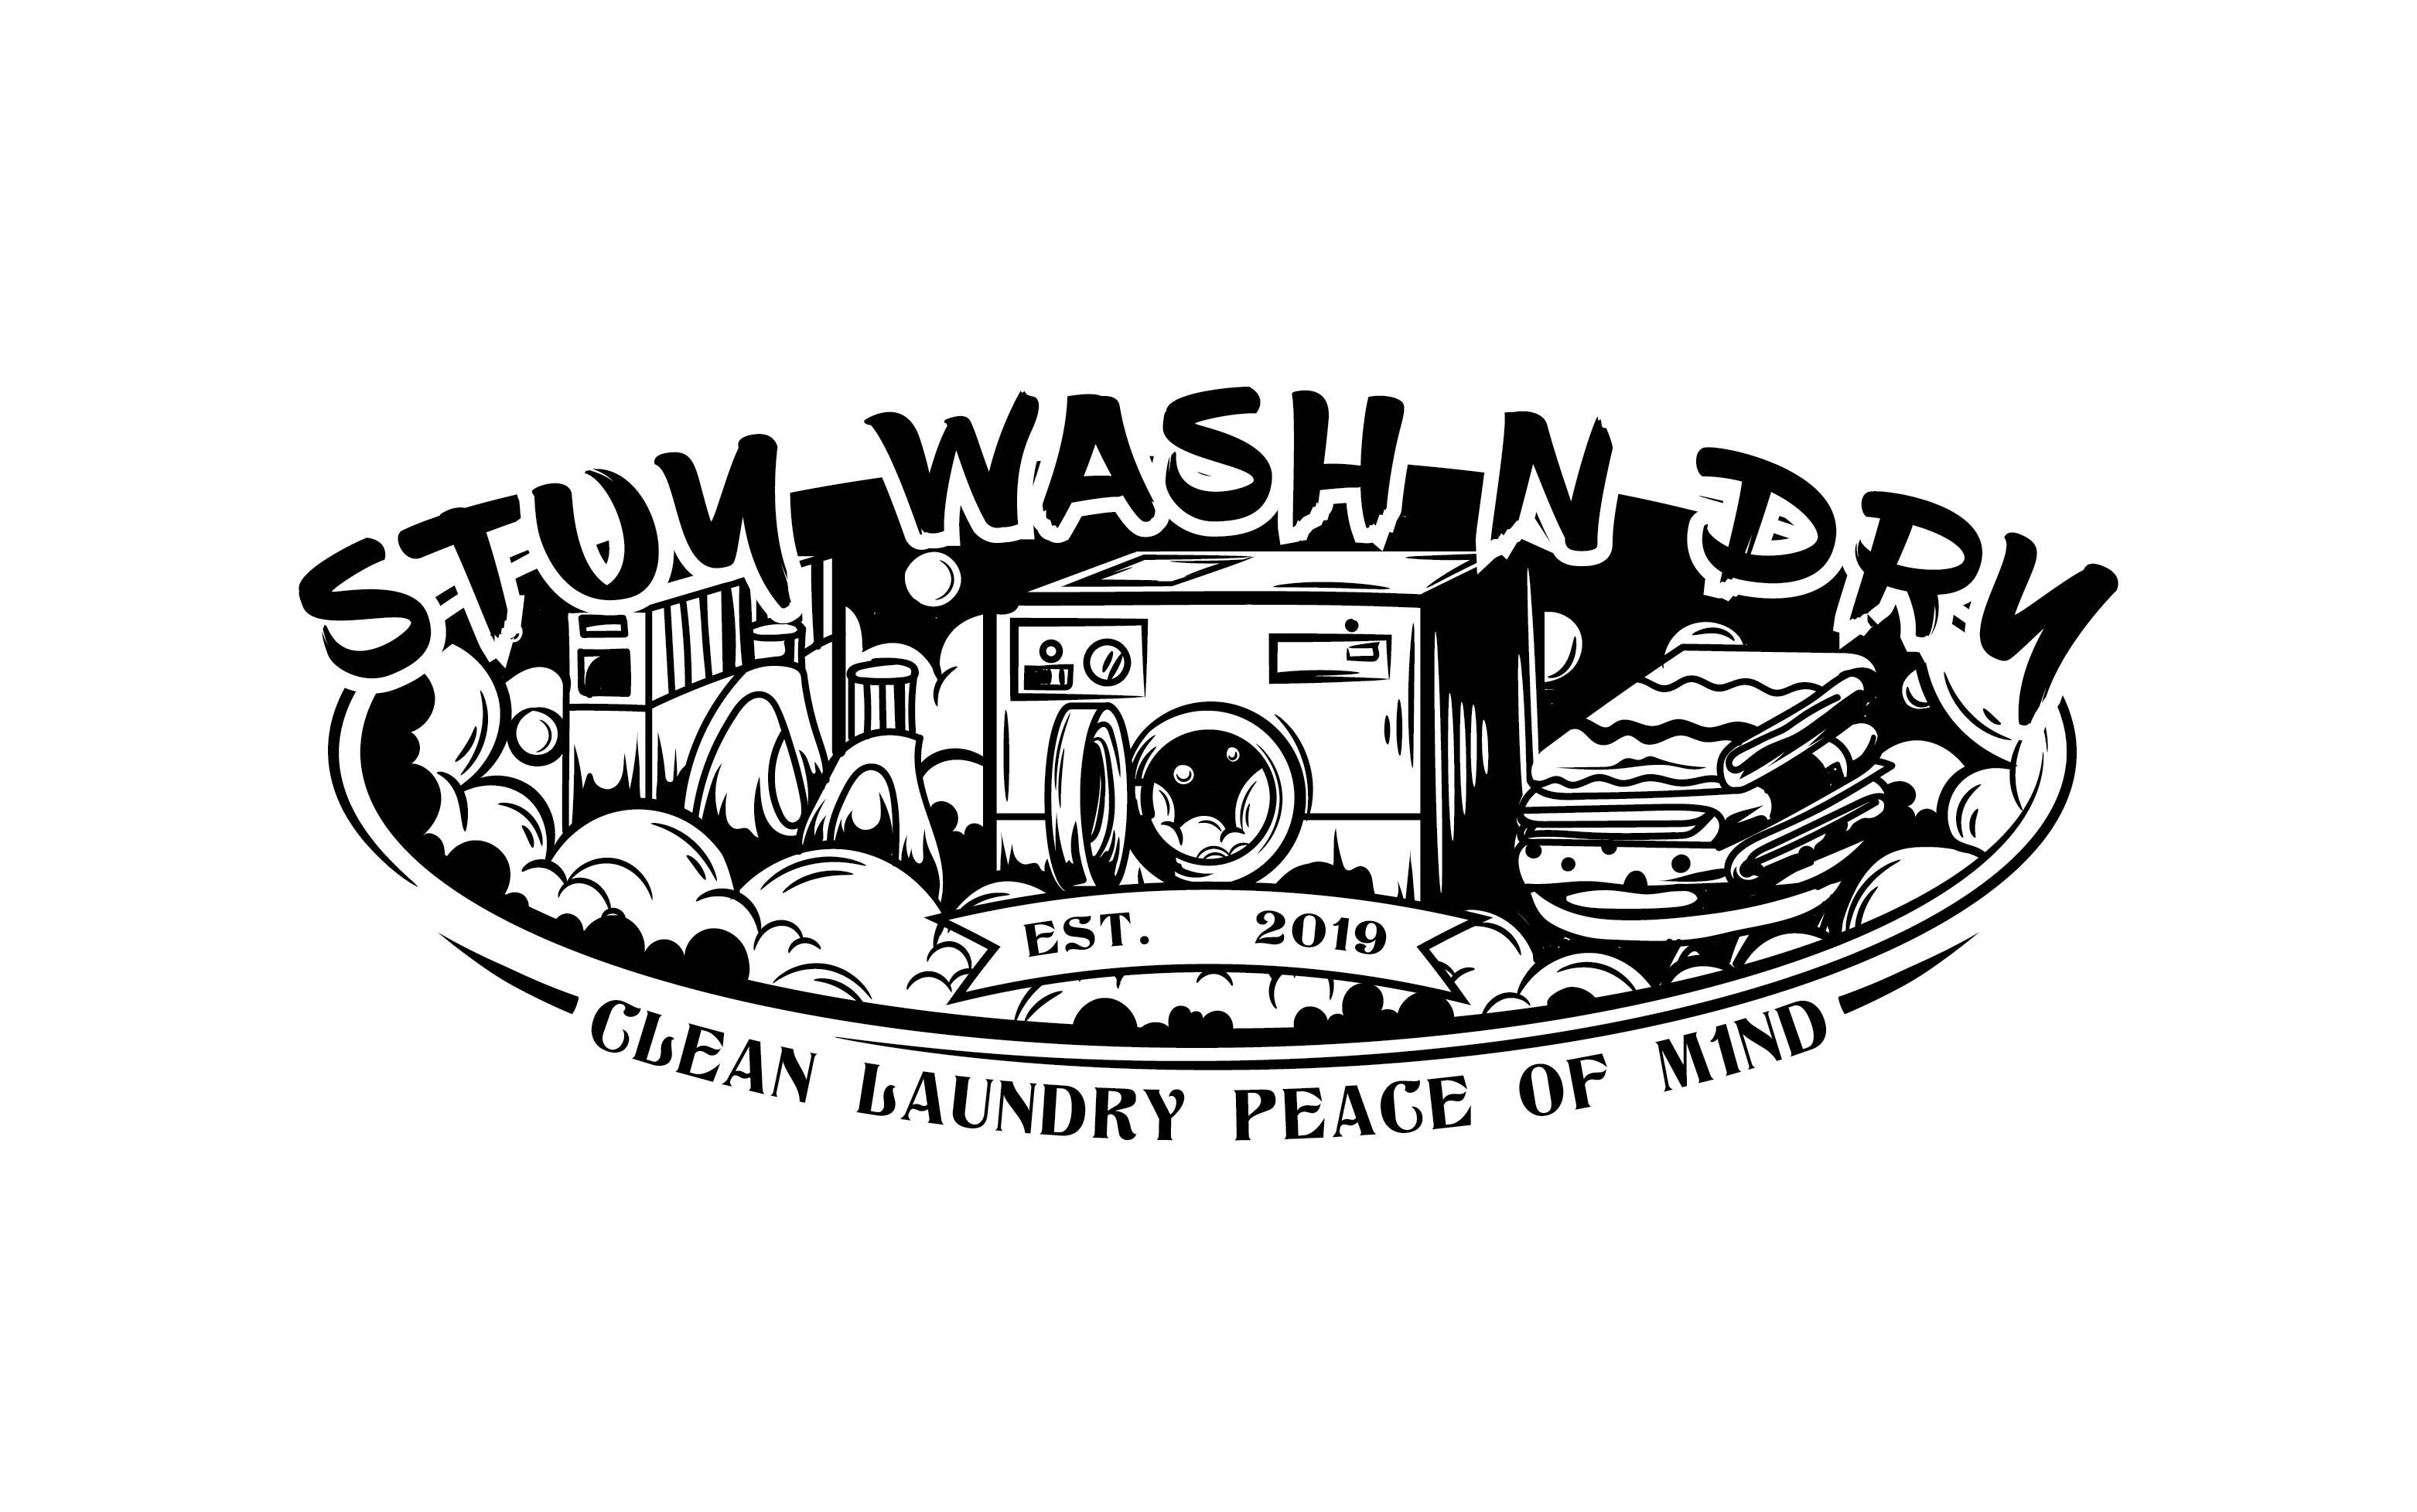 Stuy Wash N Dry Laundry Pickup Form